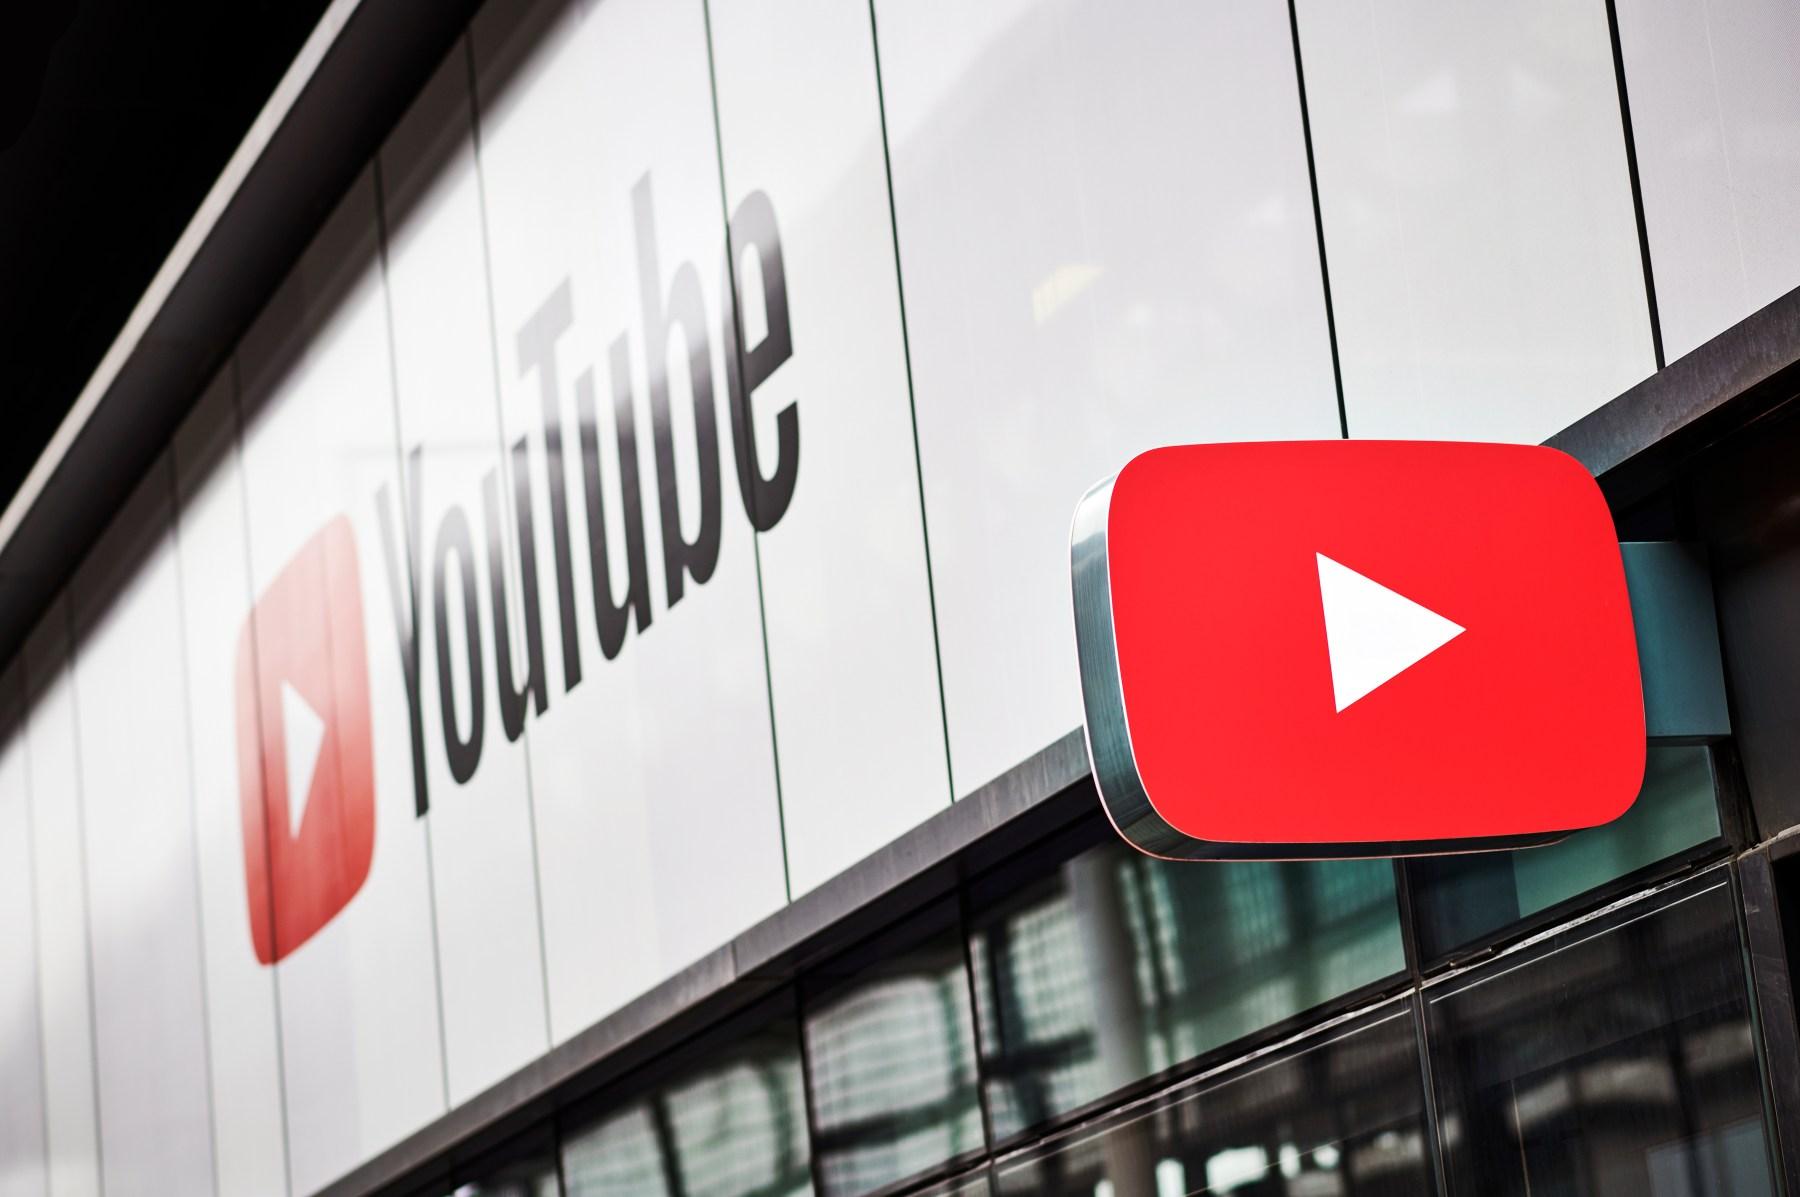 youtube more popular than netflix